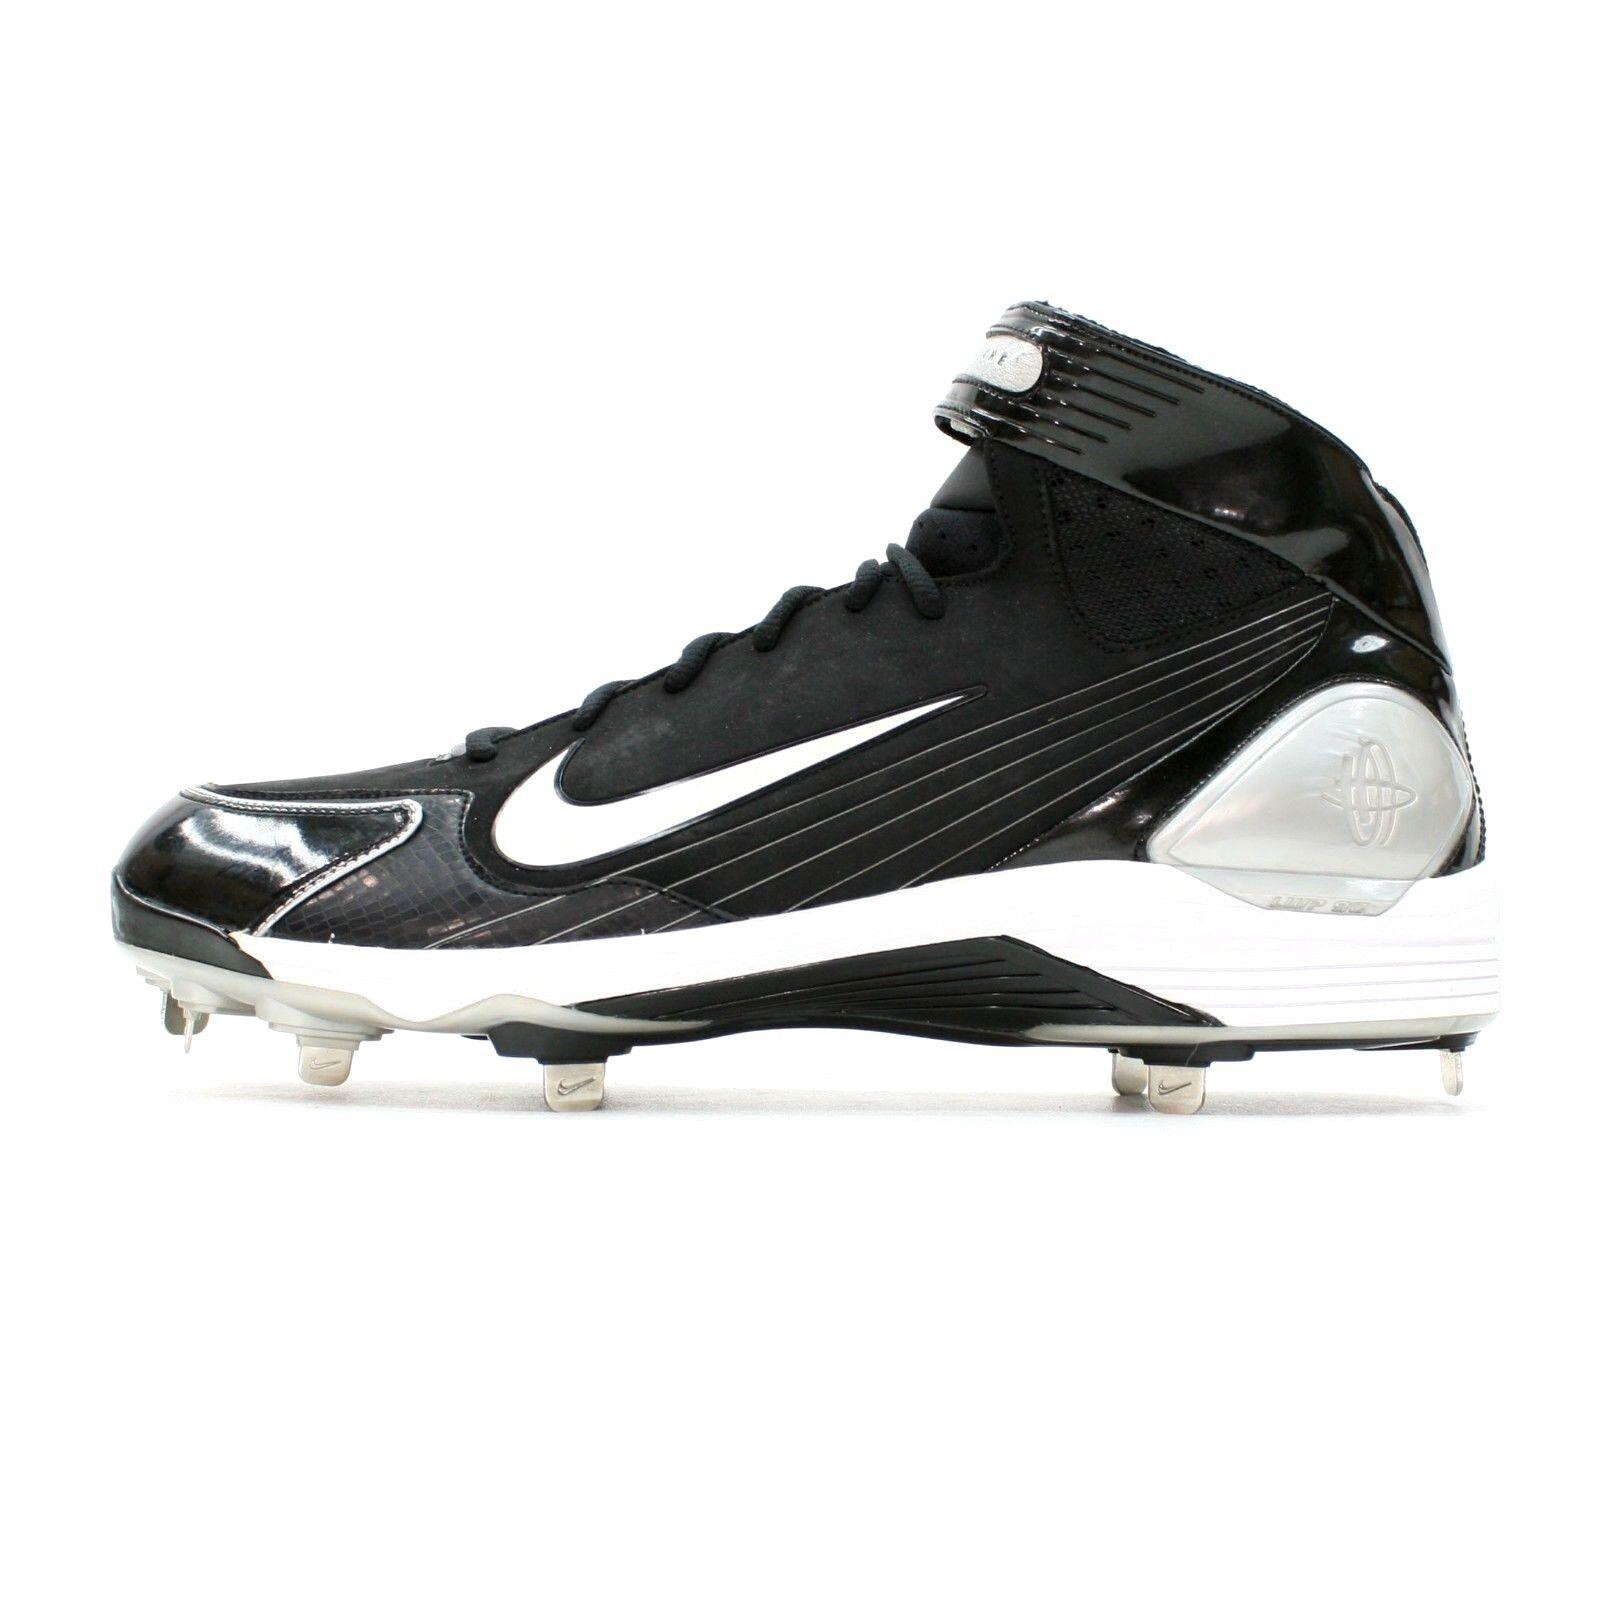 8a5aed07951 ... Nike Men s 16 16 16 Air Huarache LWP90 Baseball Softball Metal Cleats  Shoes Mint 646a47 ...